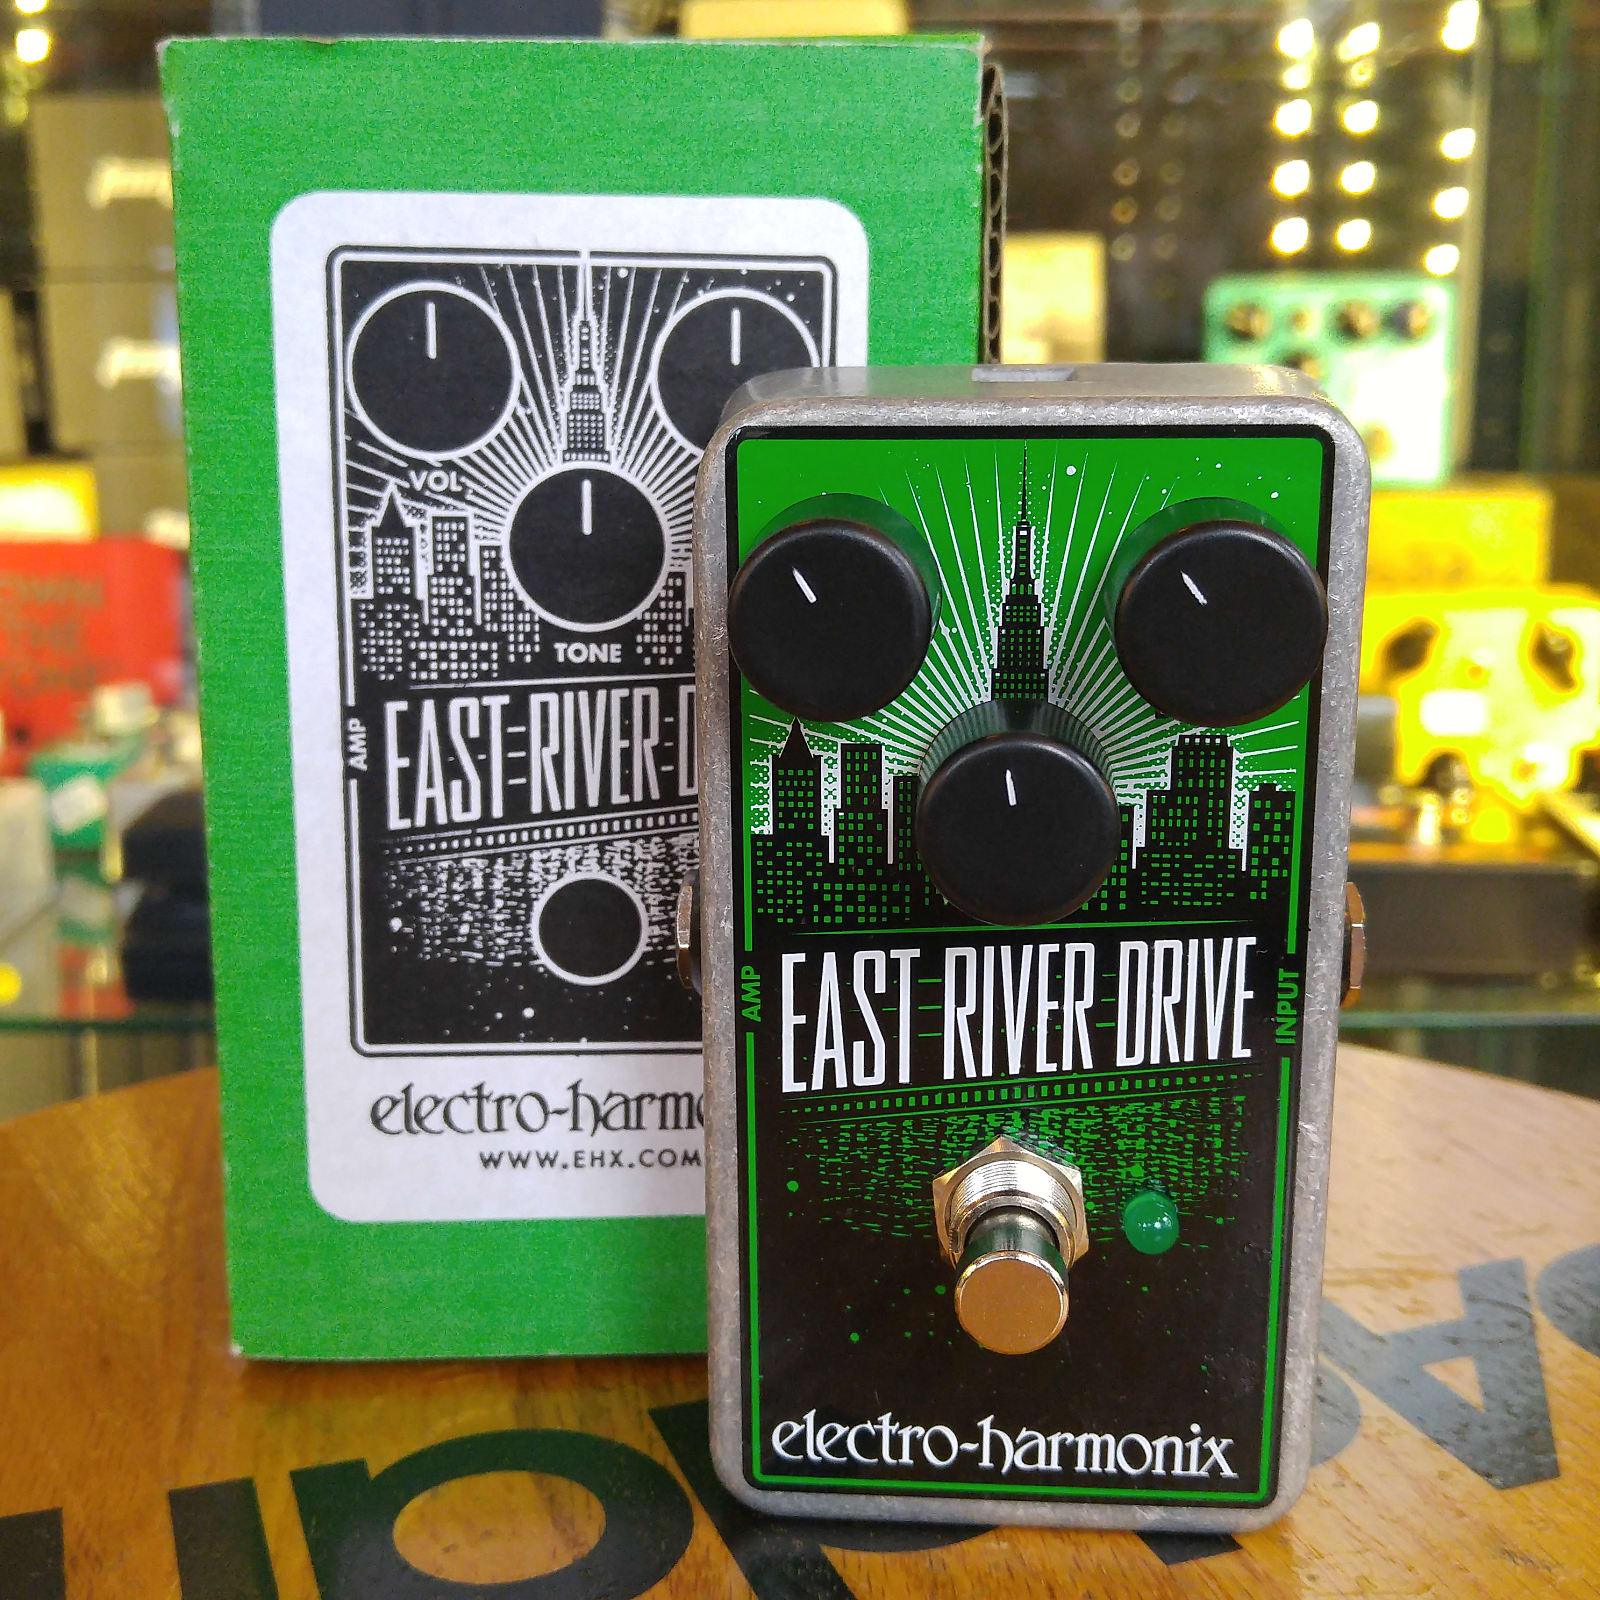 Electro-Harmonix East River Drive Overdrive Pedal 2018 #201810122718 w/Box